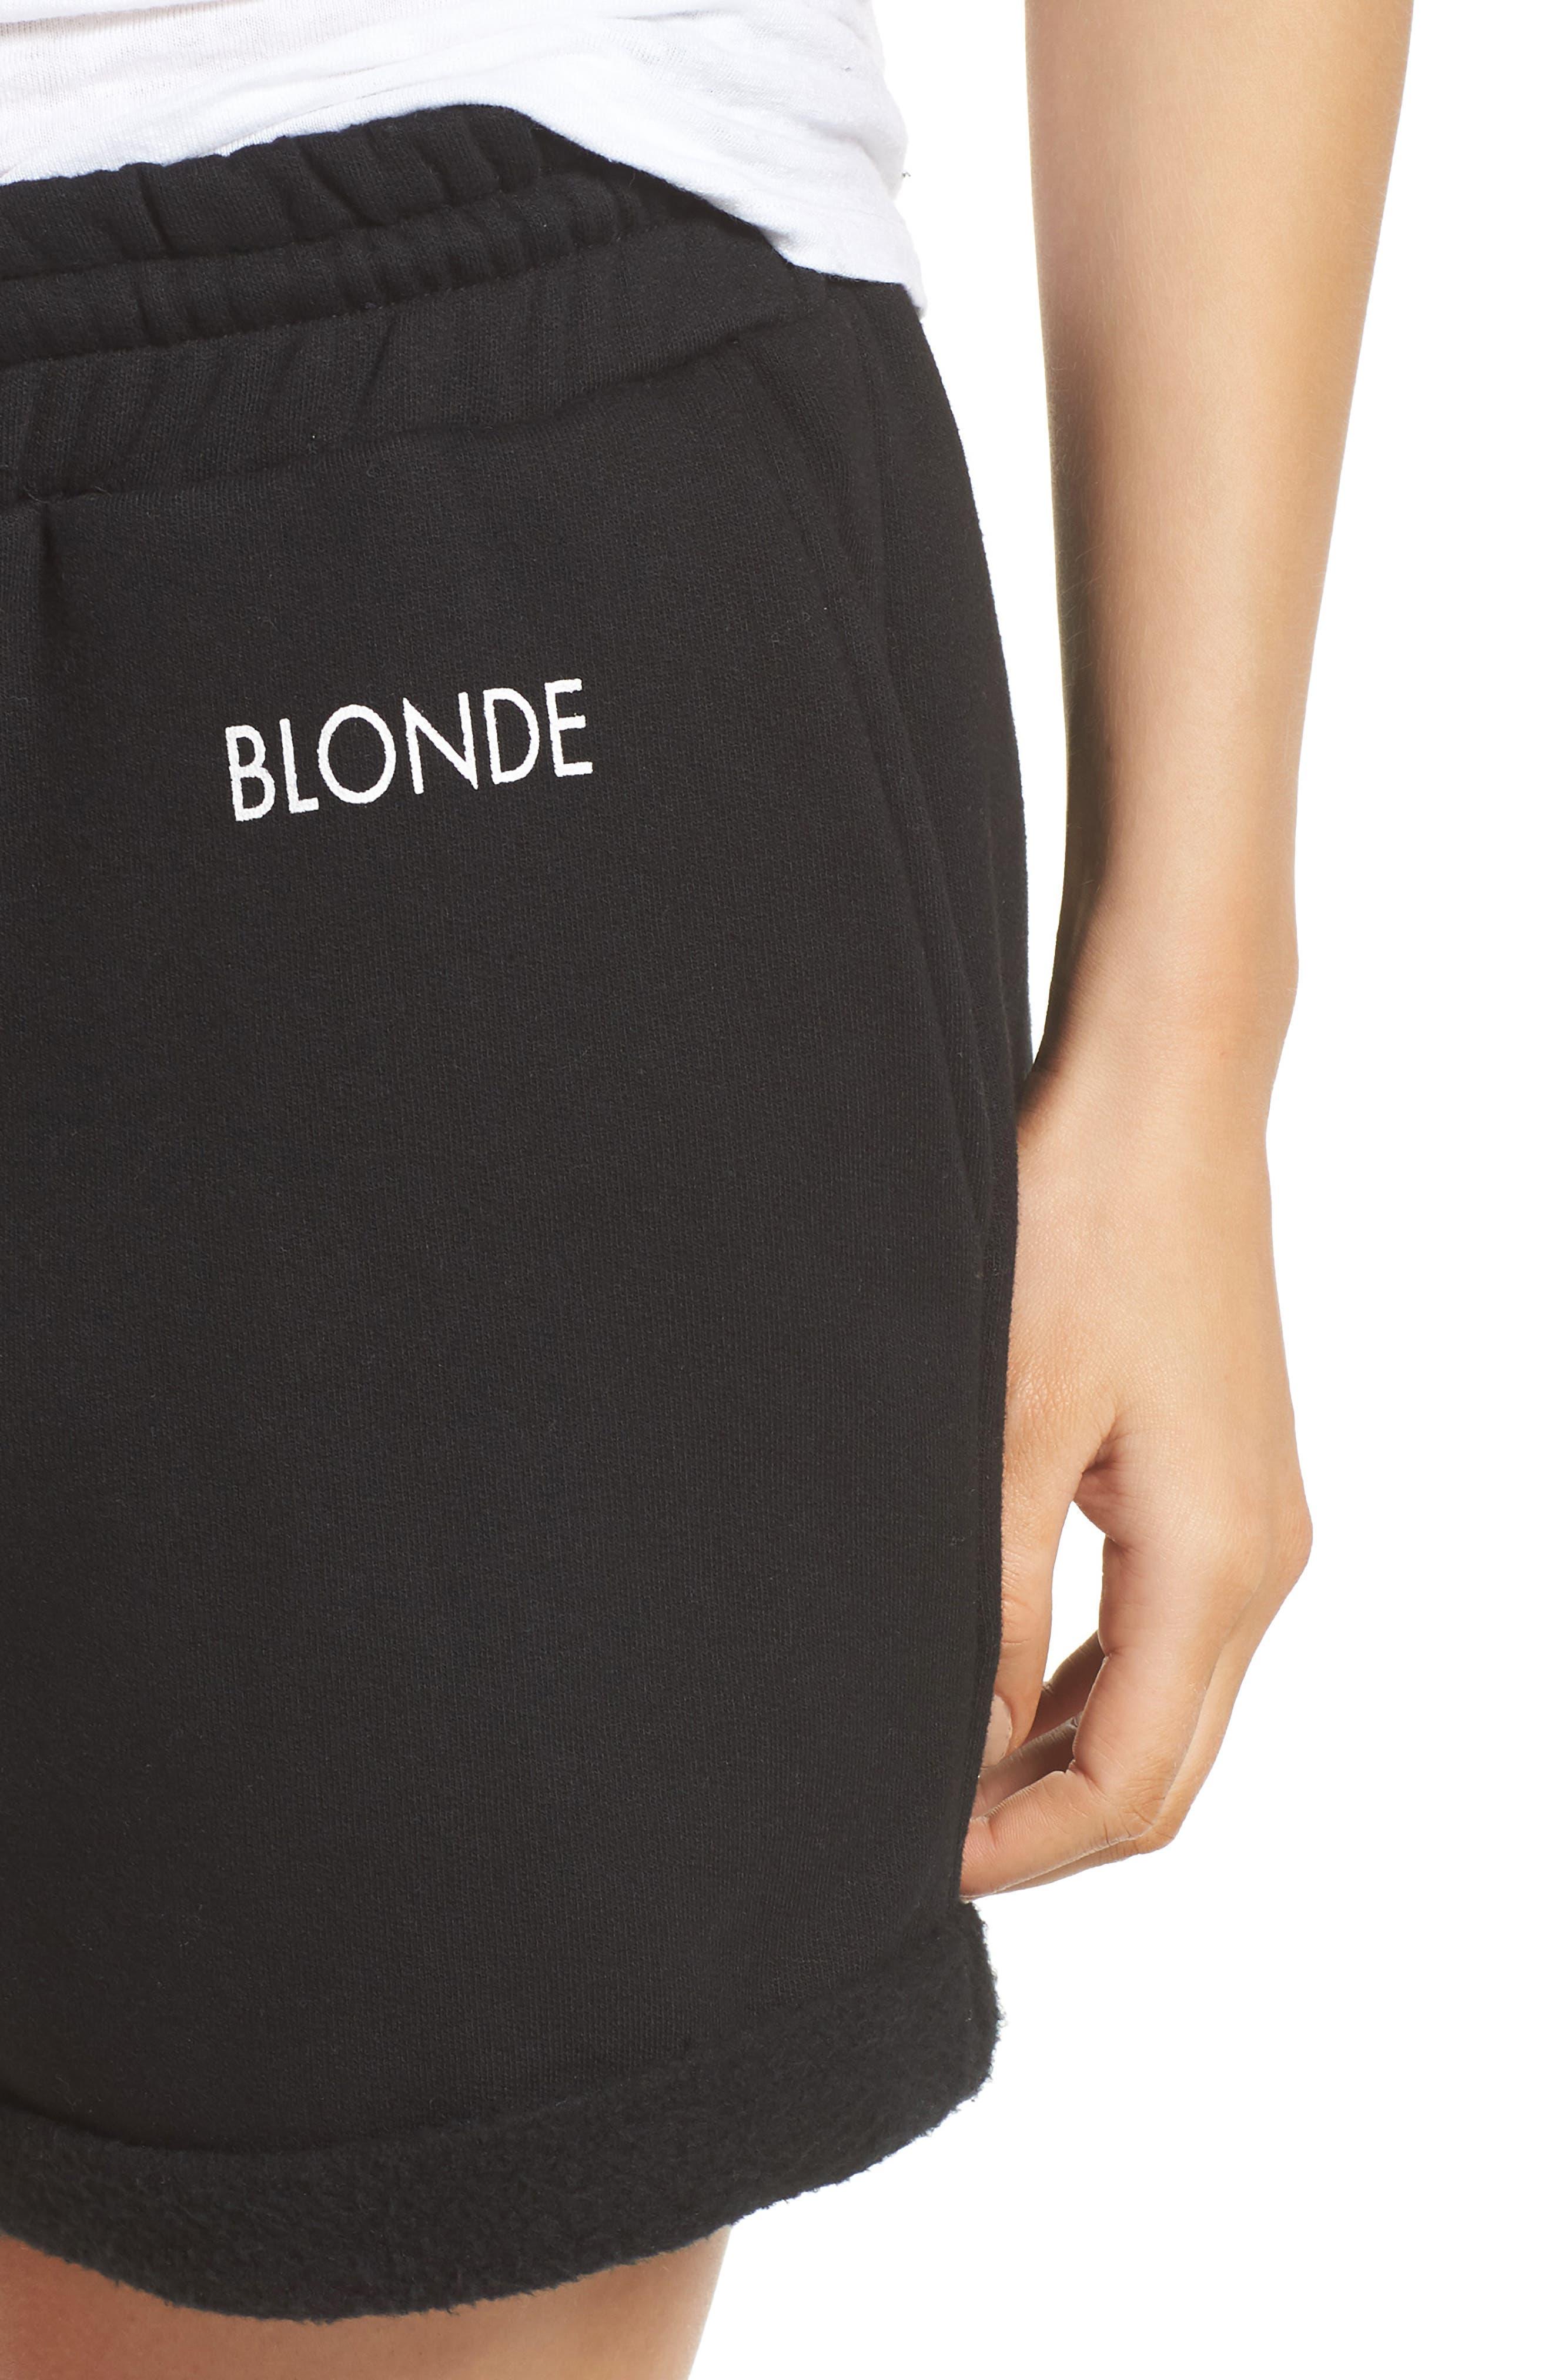 Blonde Lounge Shorts,                             Alternate thumbnail 5, color,                             Black